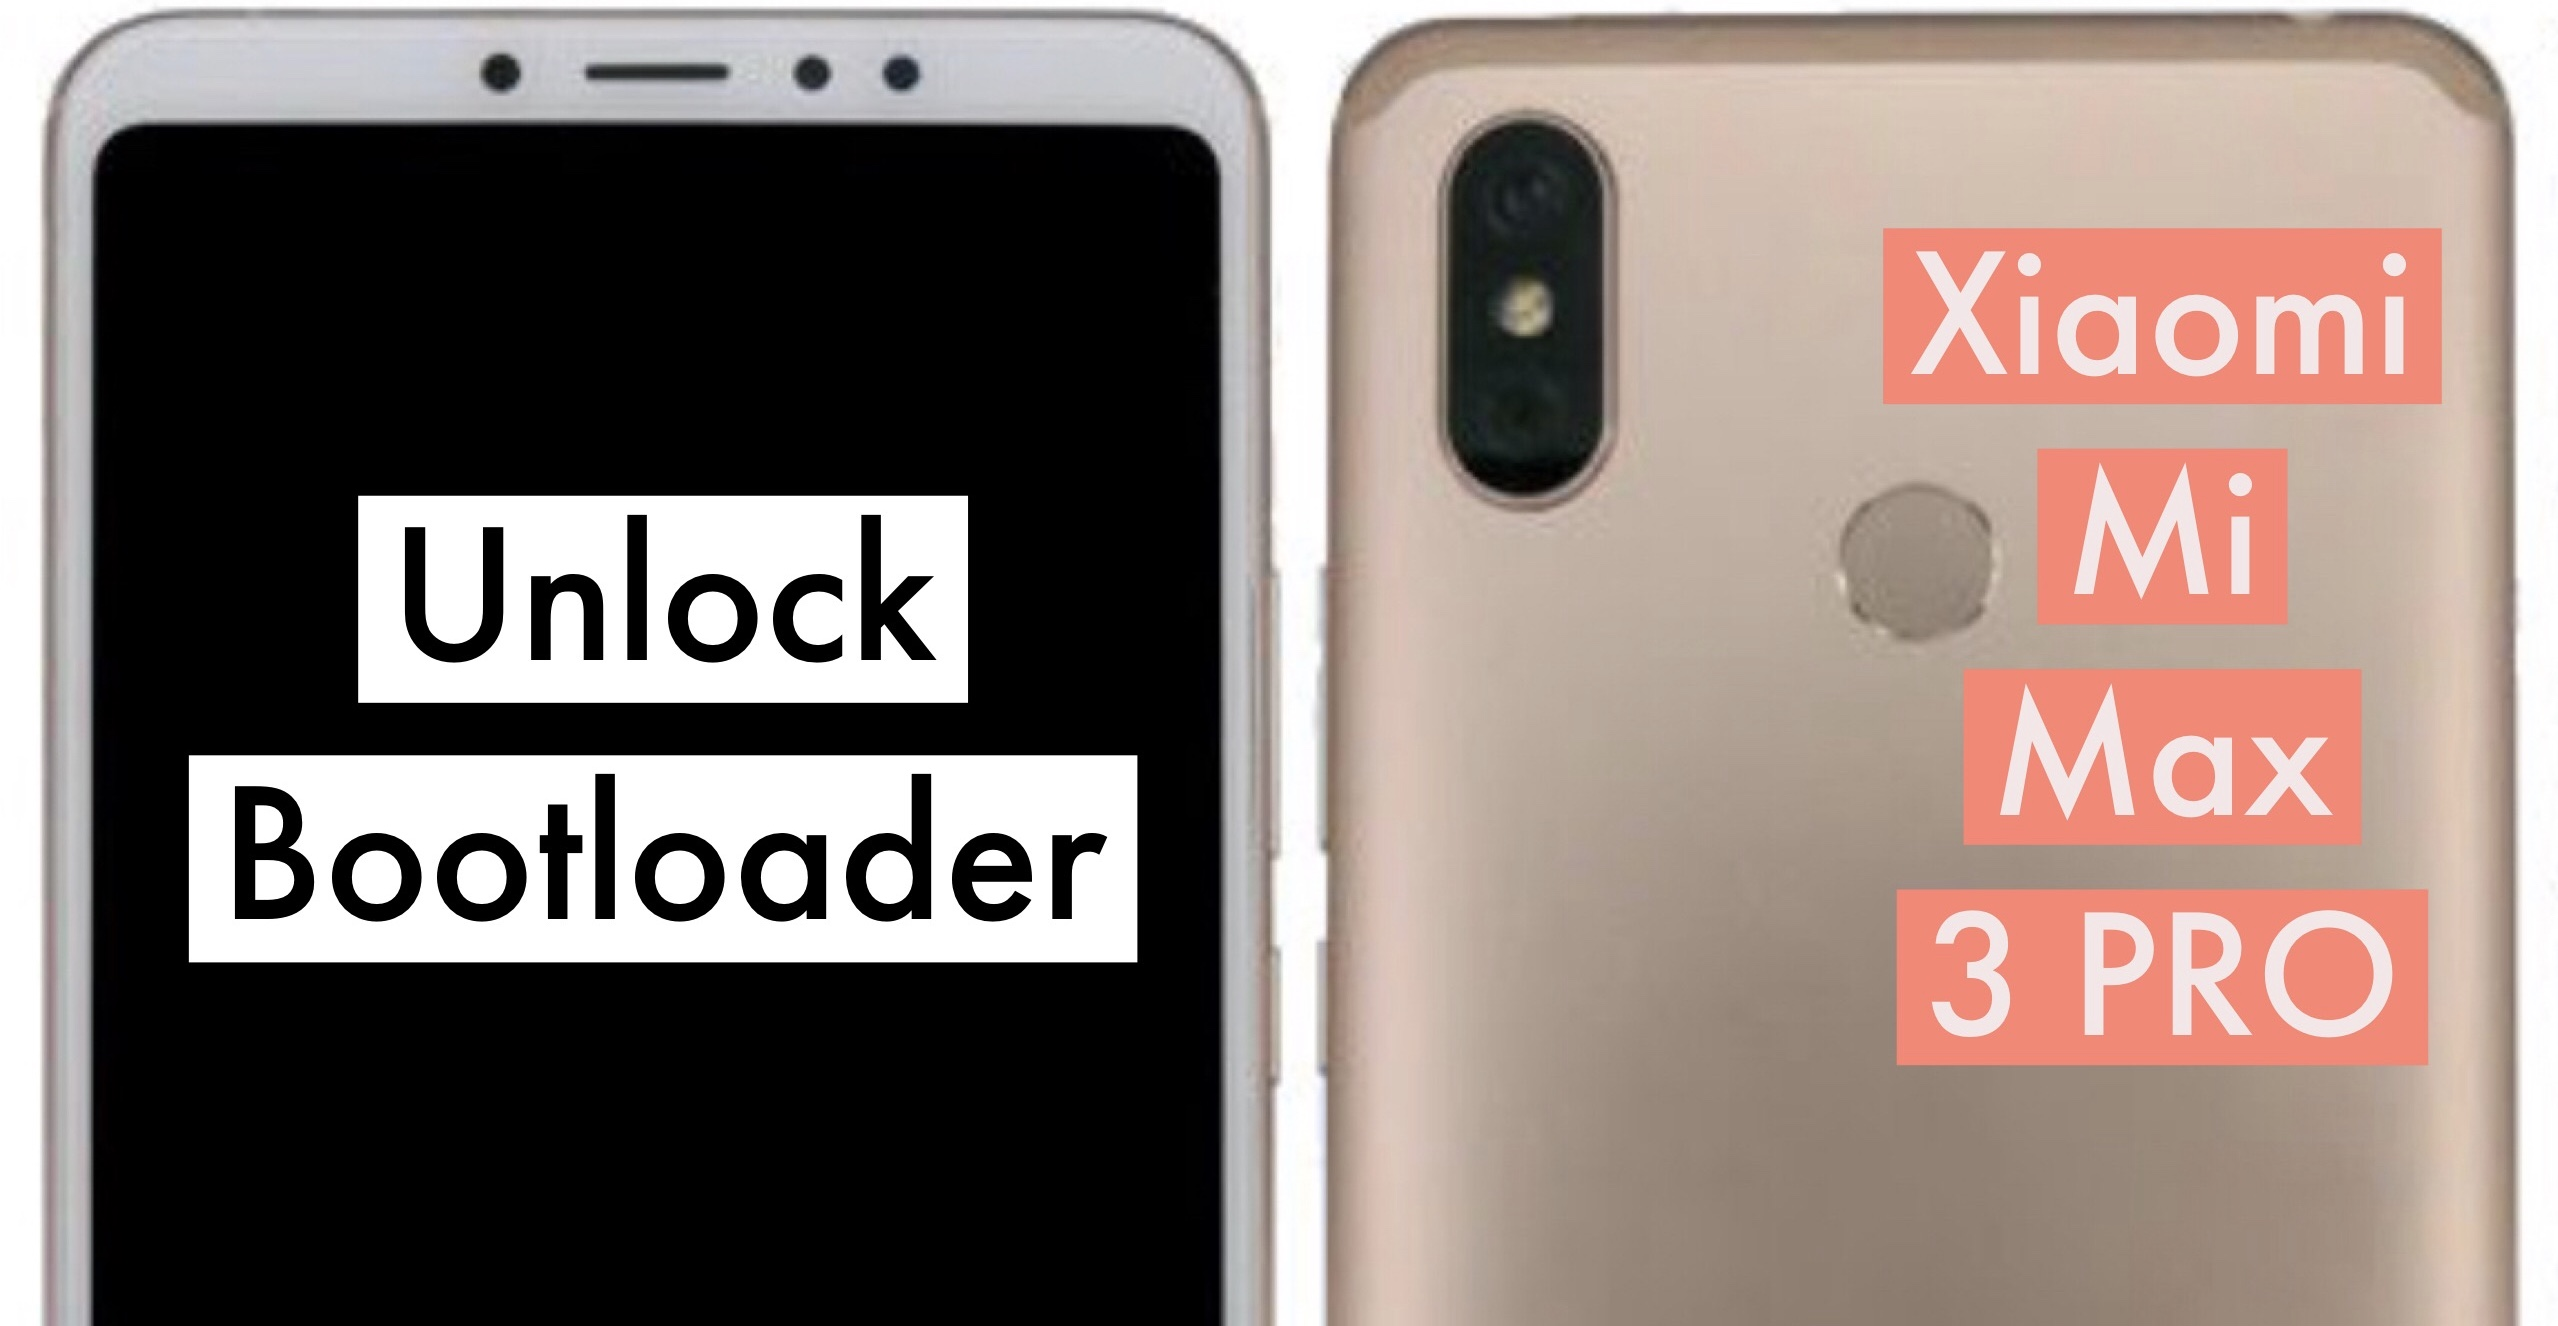 How to Unlock Bootloader on Xiaomi Mi Max 3 PRO? Flash